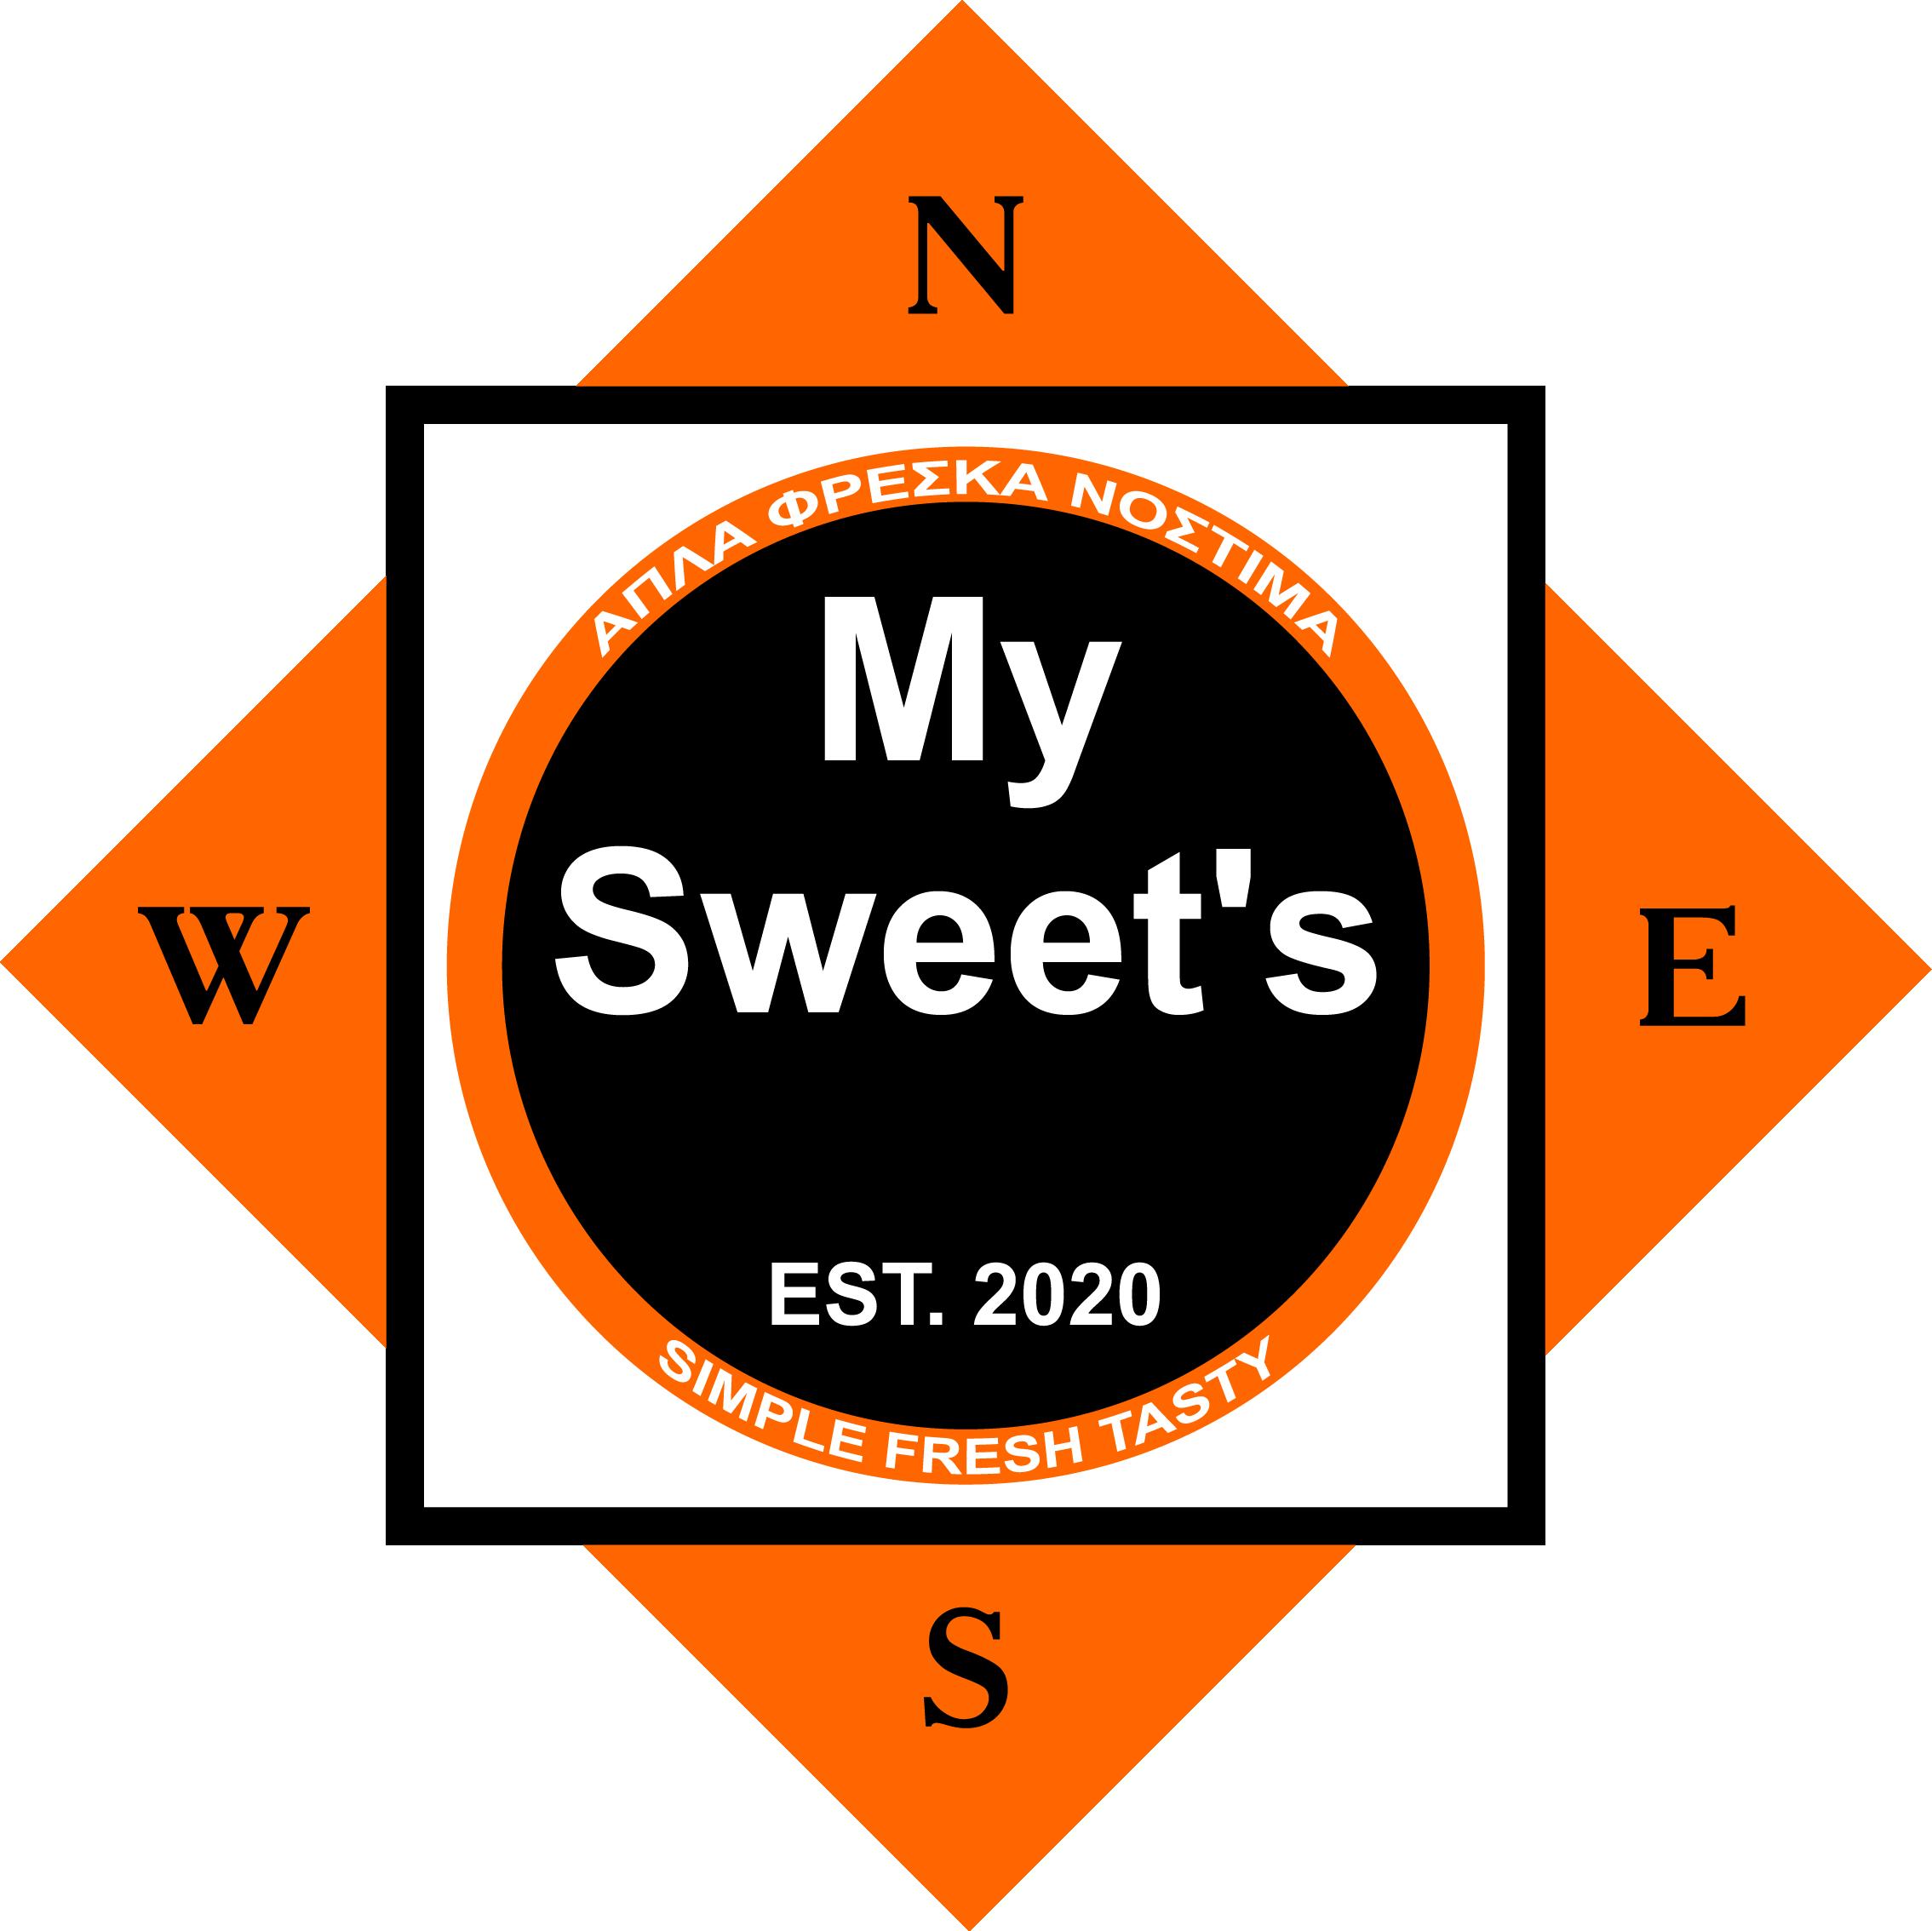 My Sweet's 2020